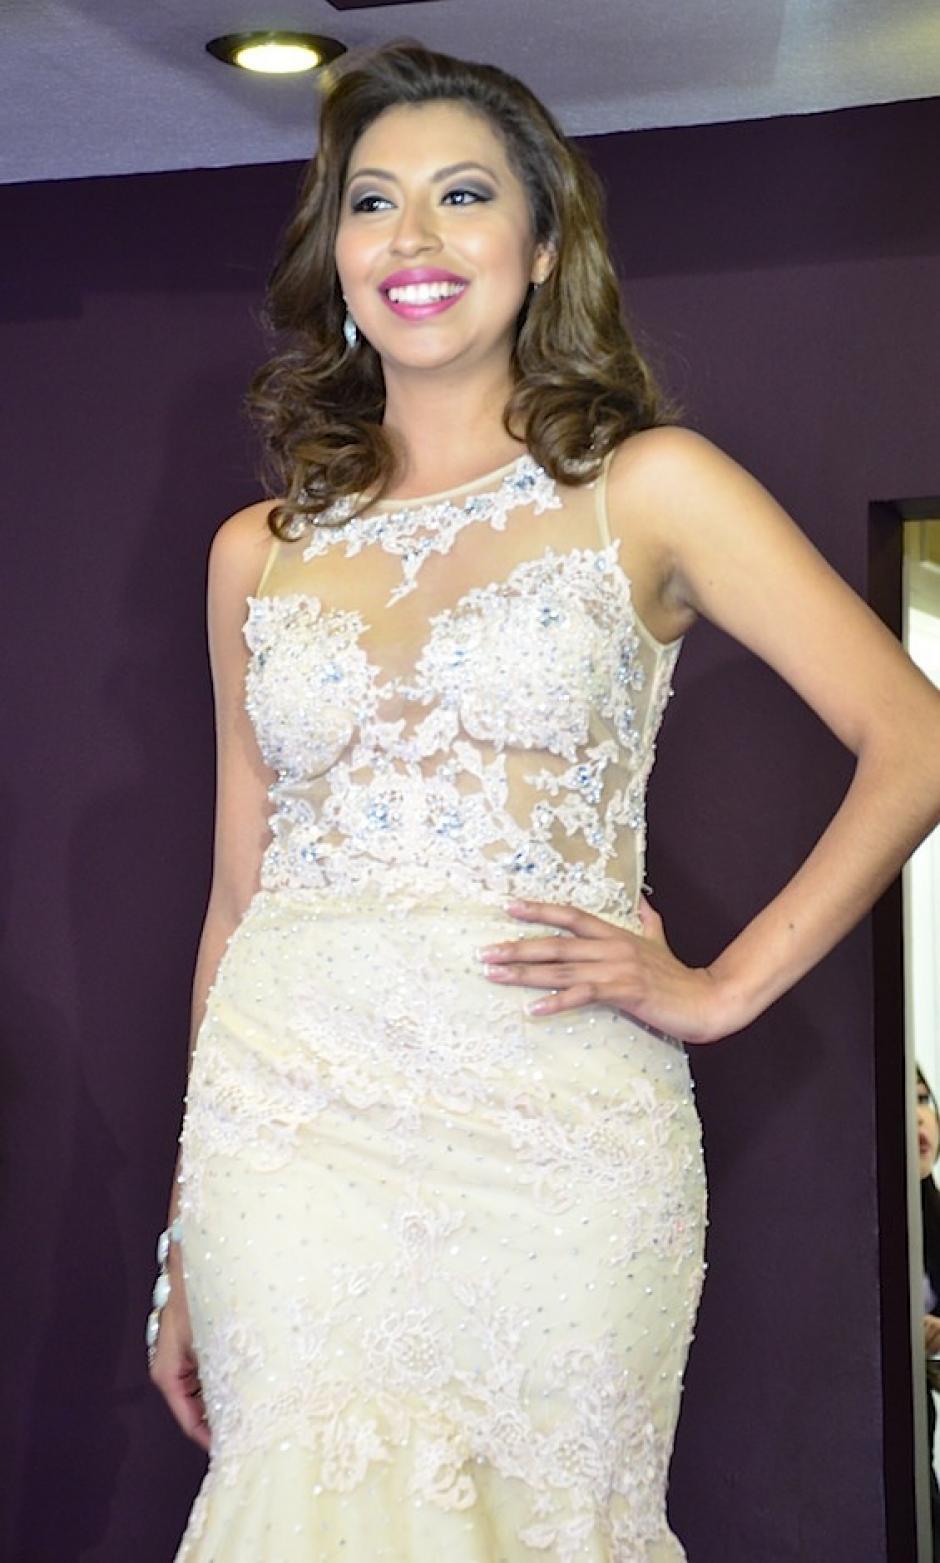 Sacatepéquez está representada por Sucell Imelda Barrientos. (Foto: Selene Mejía/Soy502)